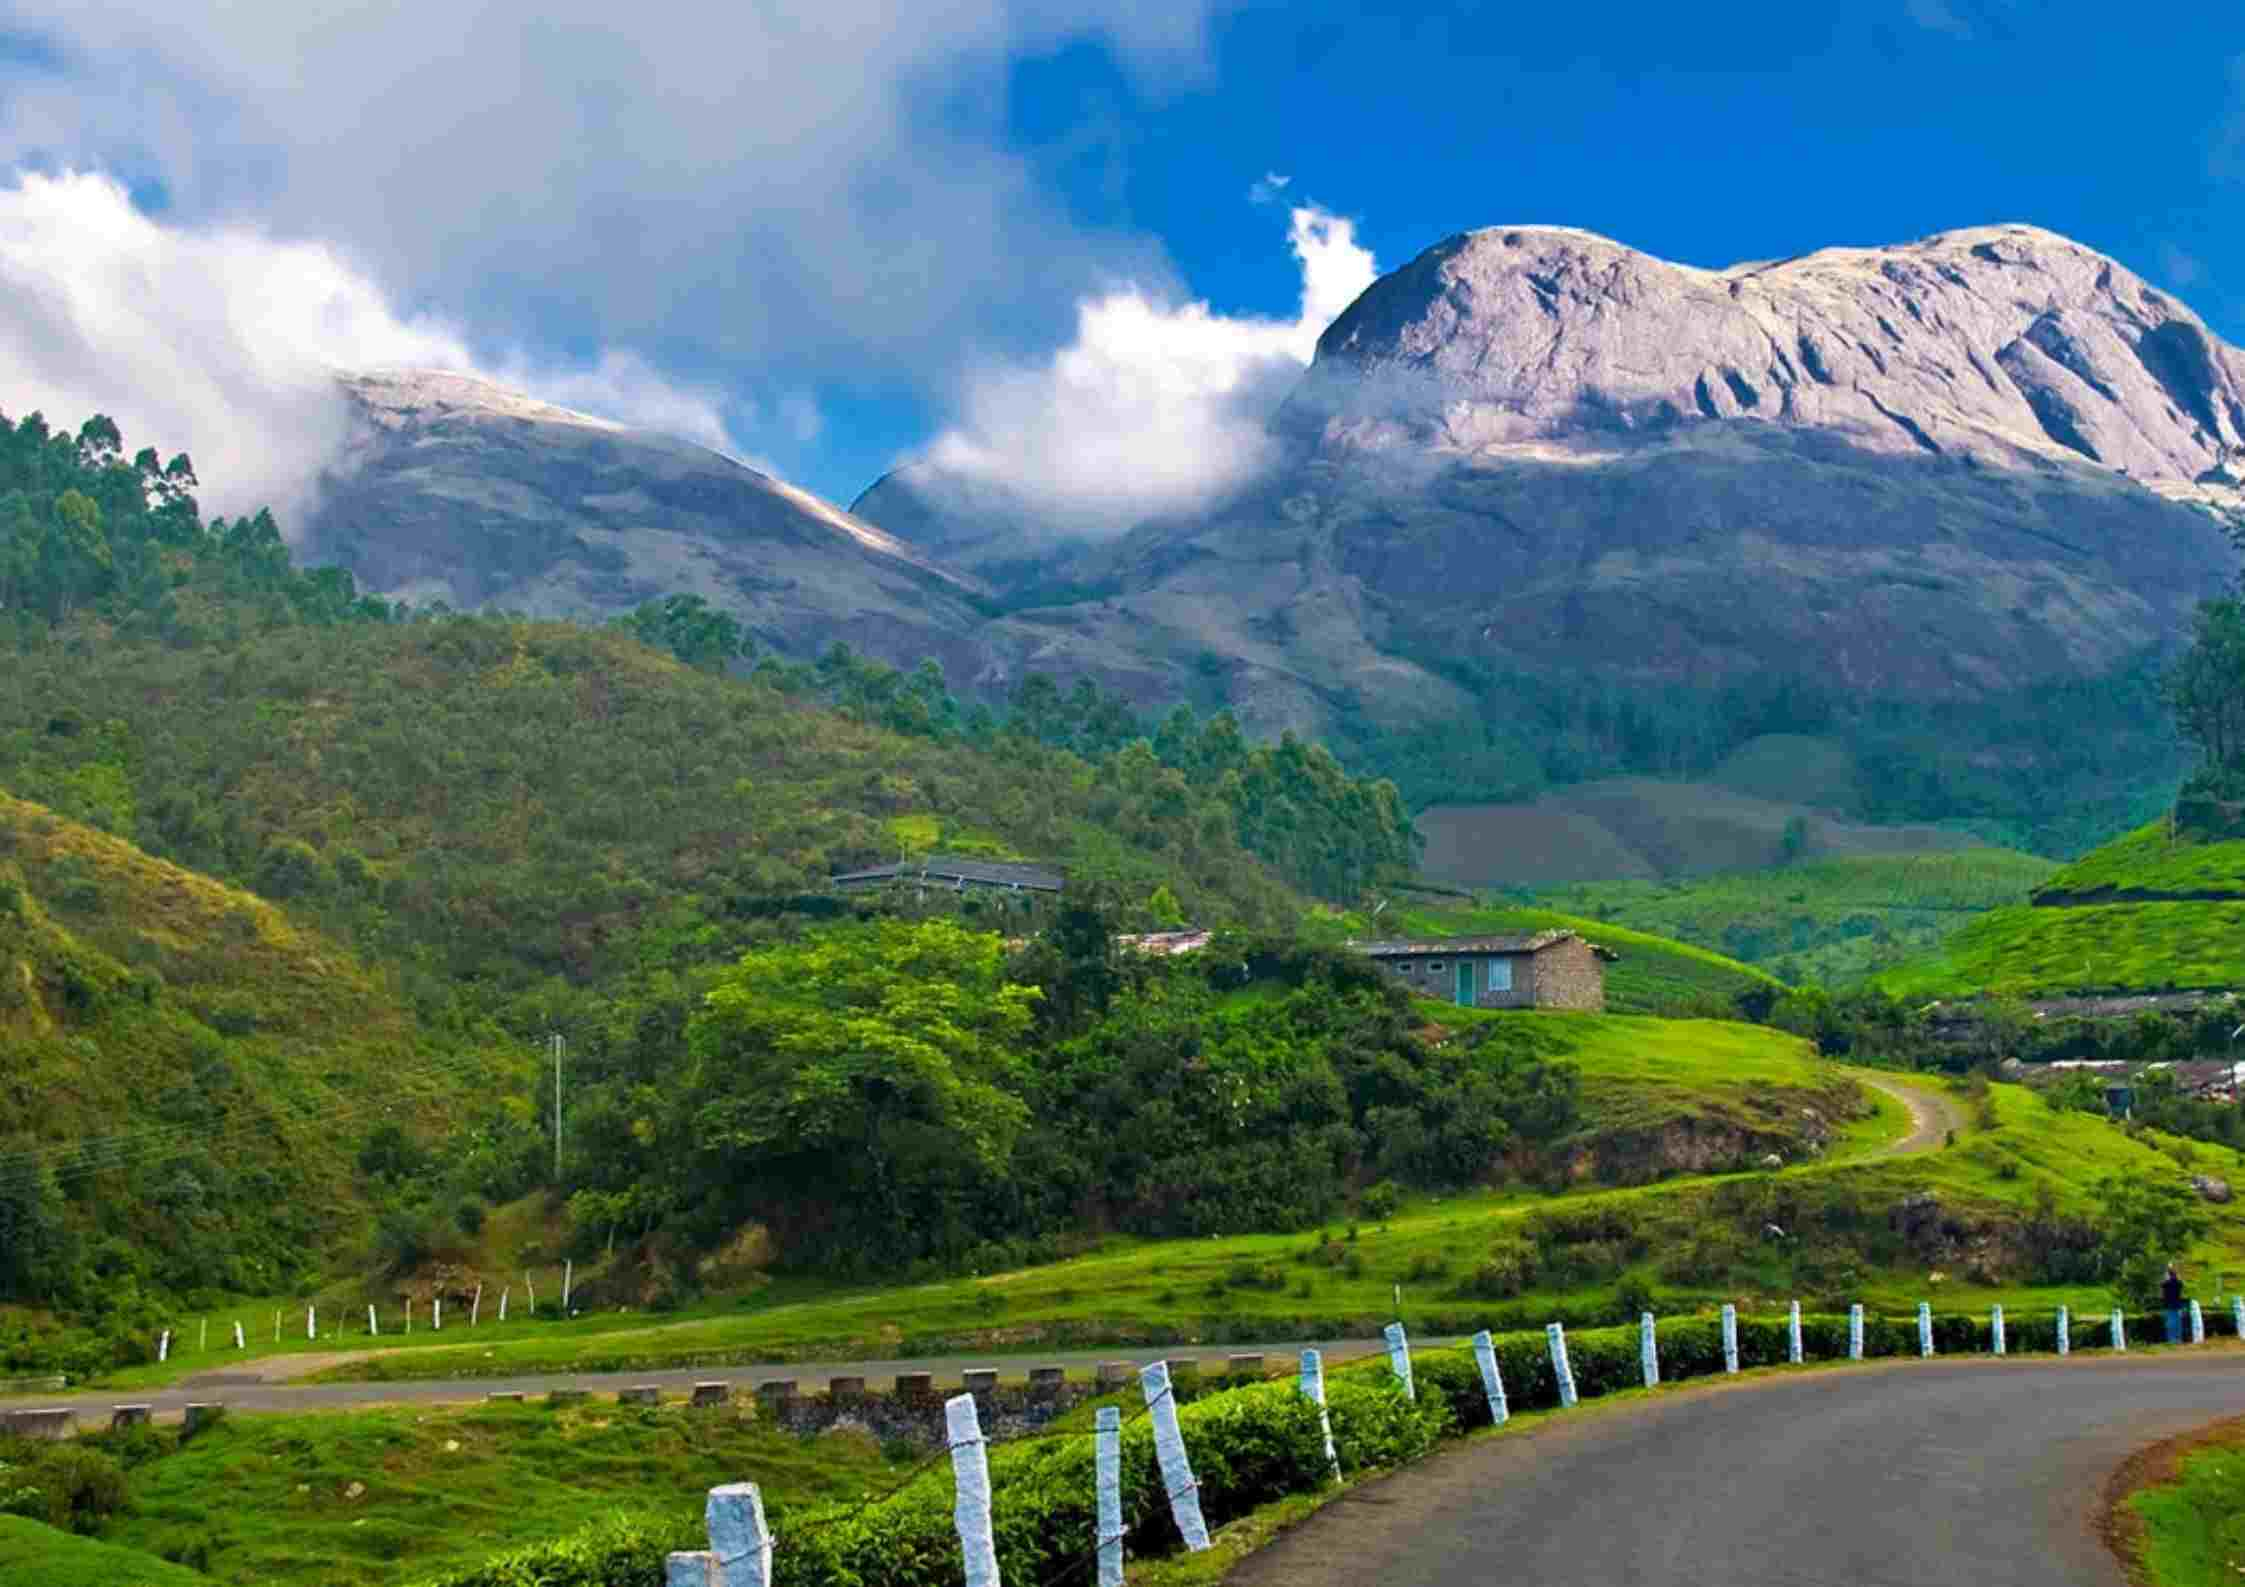 hills in Munnar